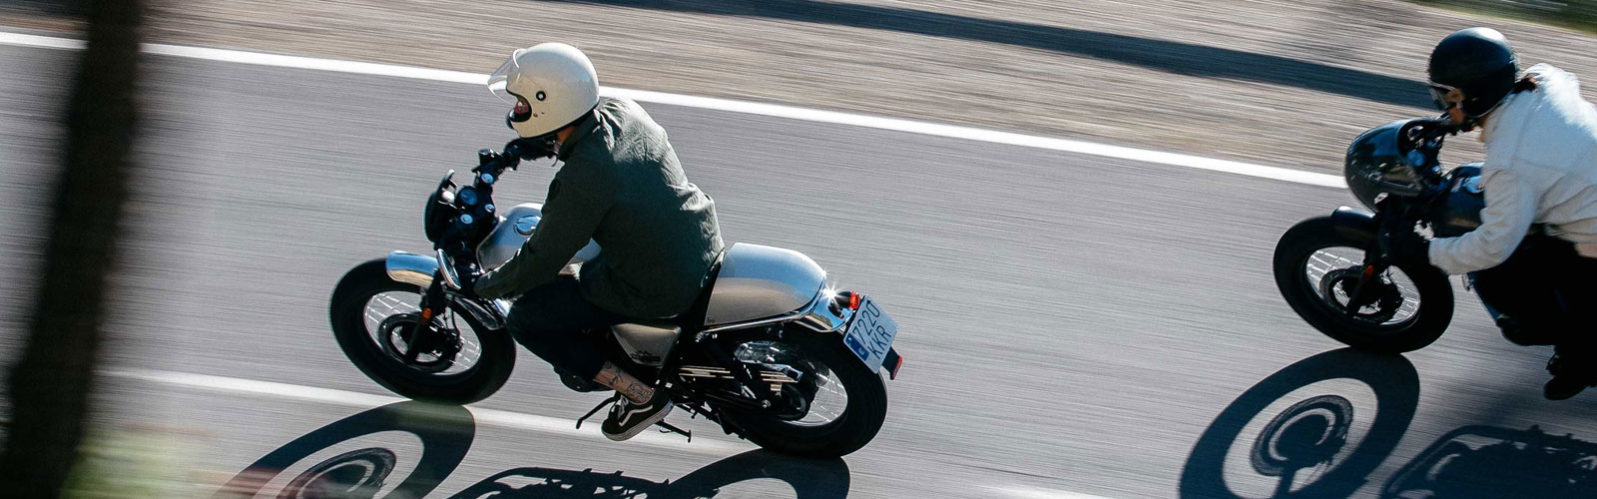 Brixton - Motos BX 125 R caféracer